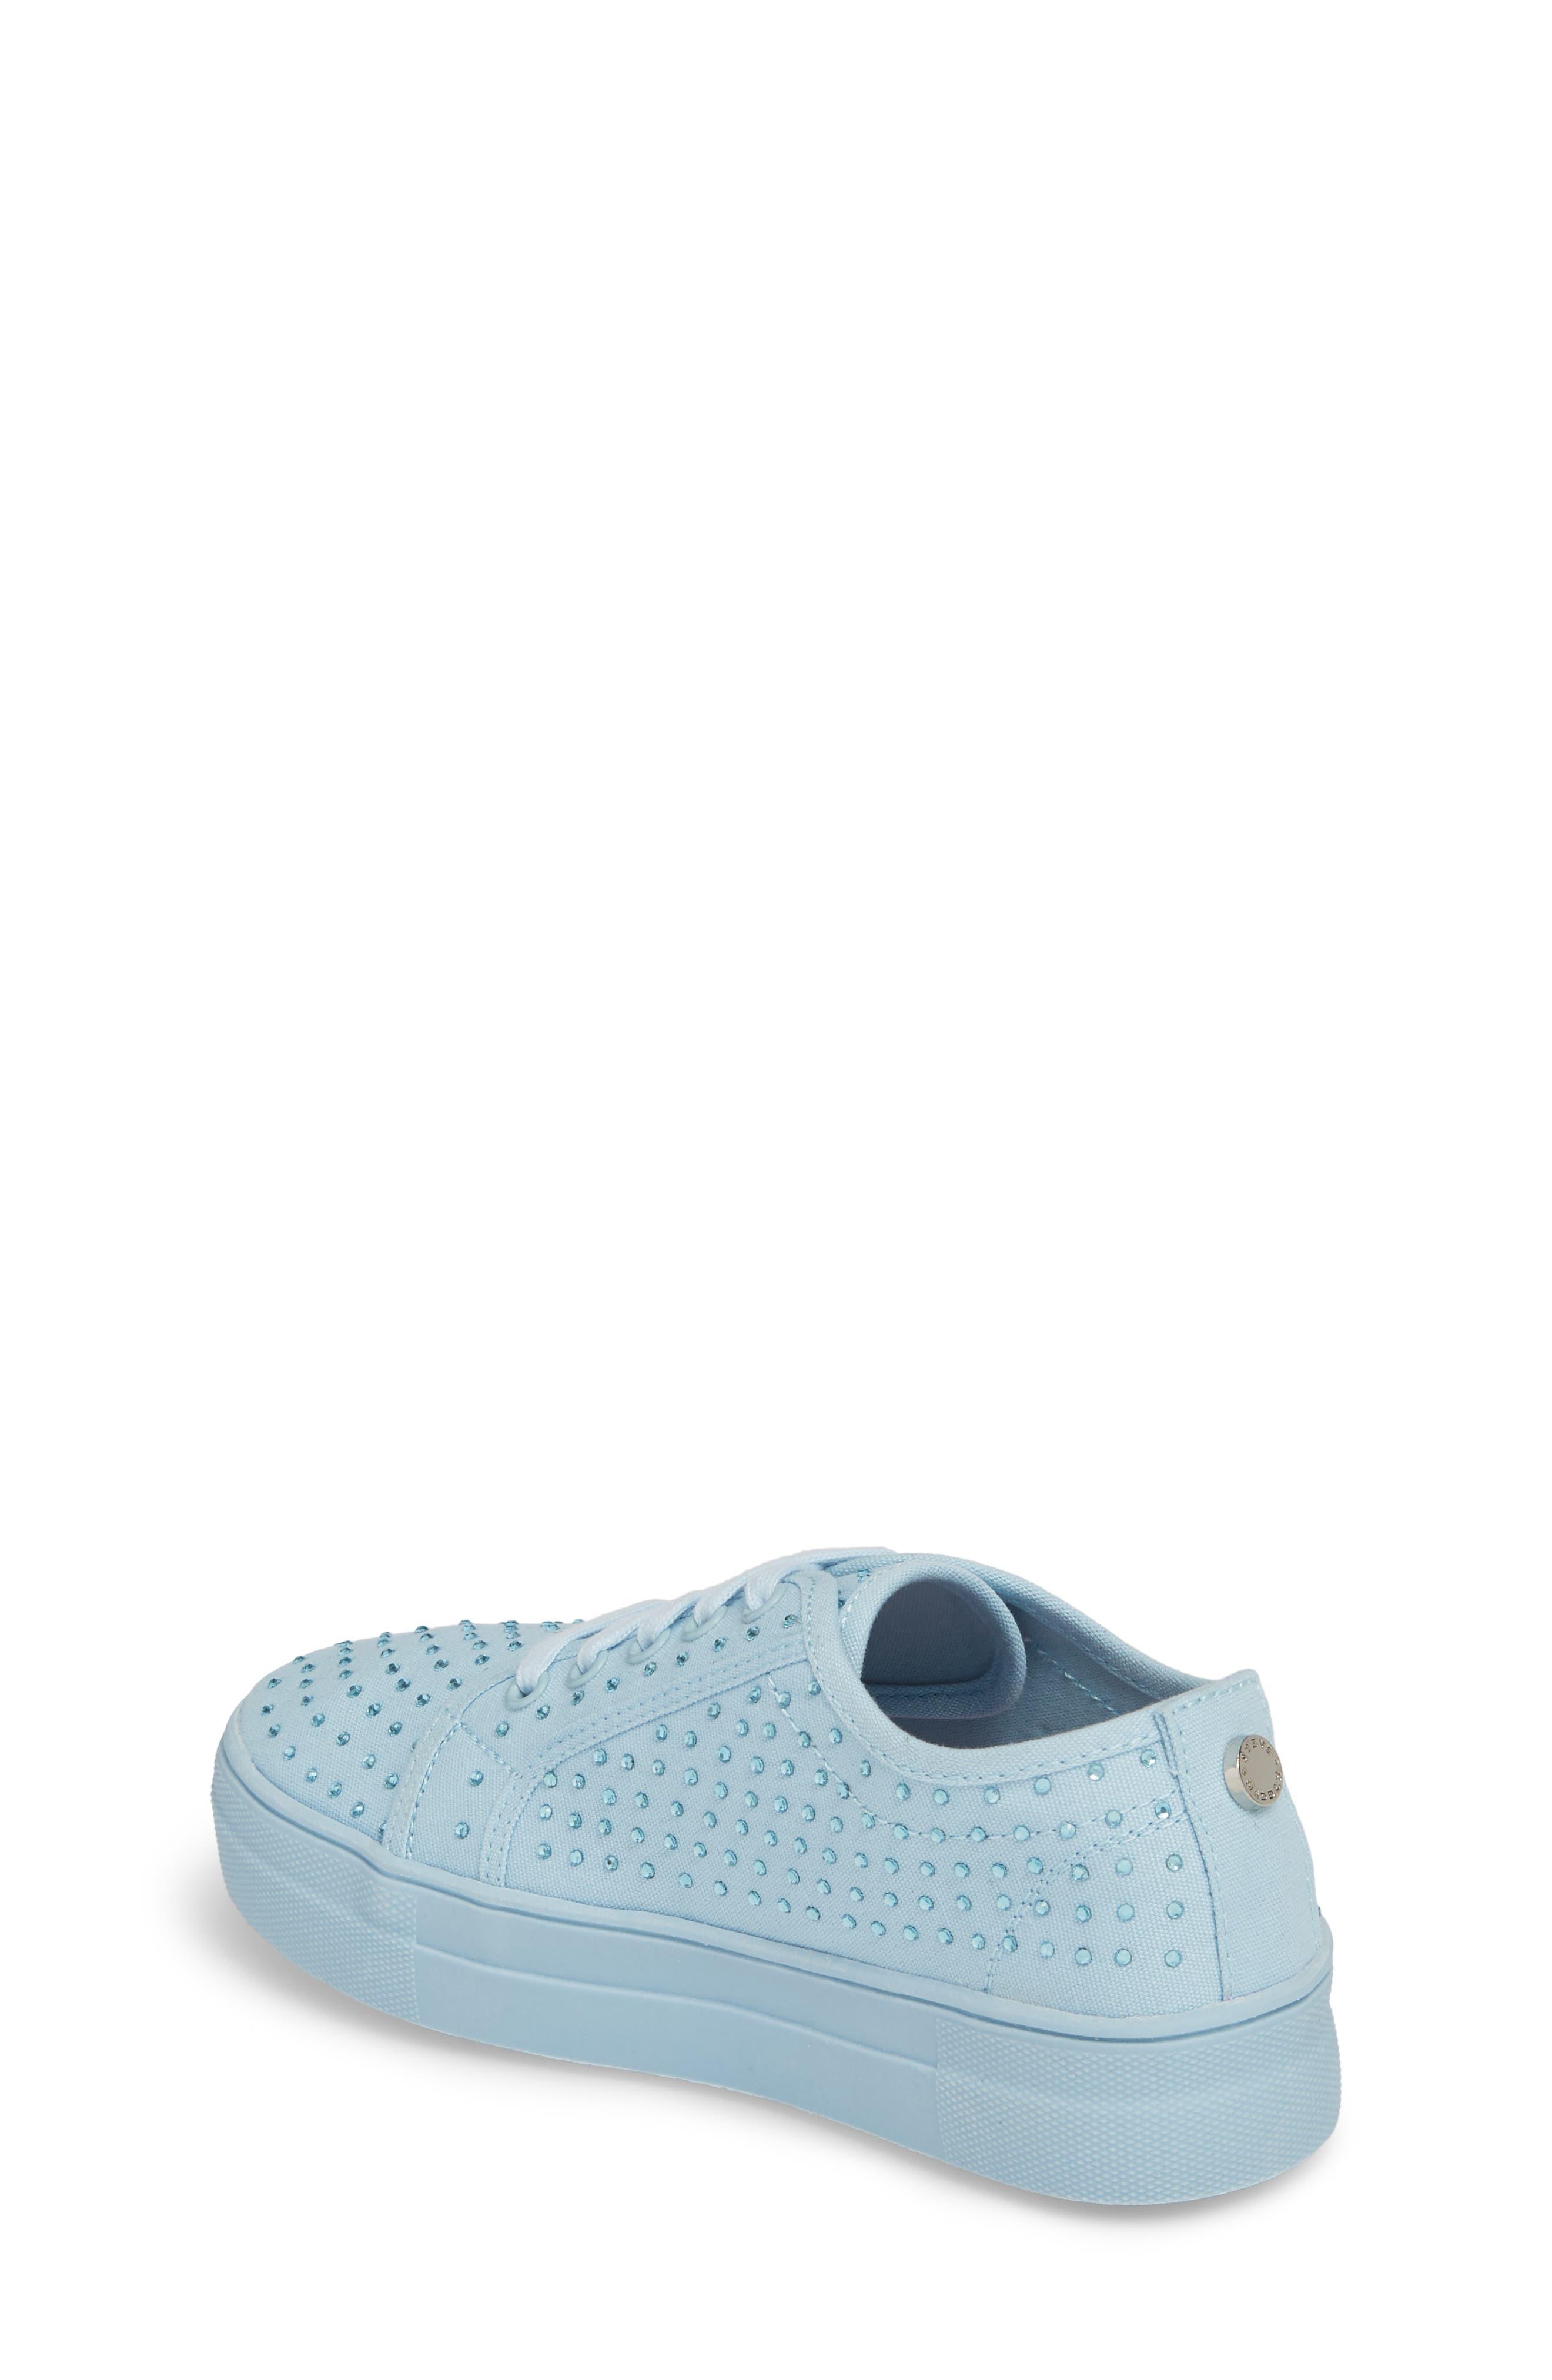 Jmono Sneaker,                             Alternate thumbnail 2, color,                             Blue